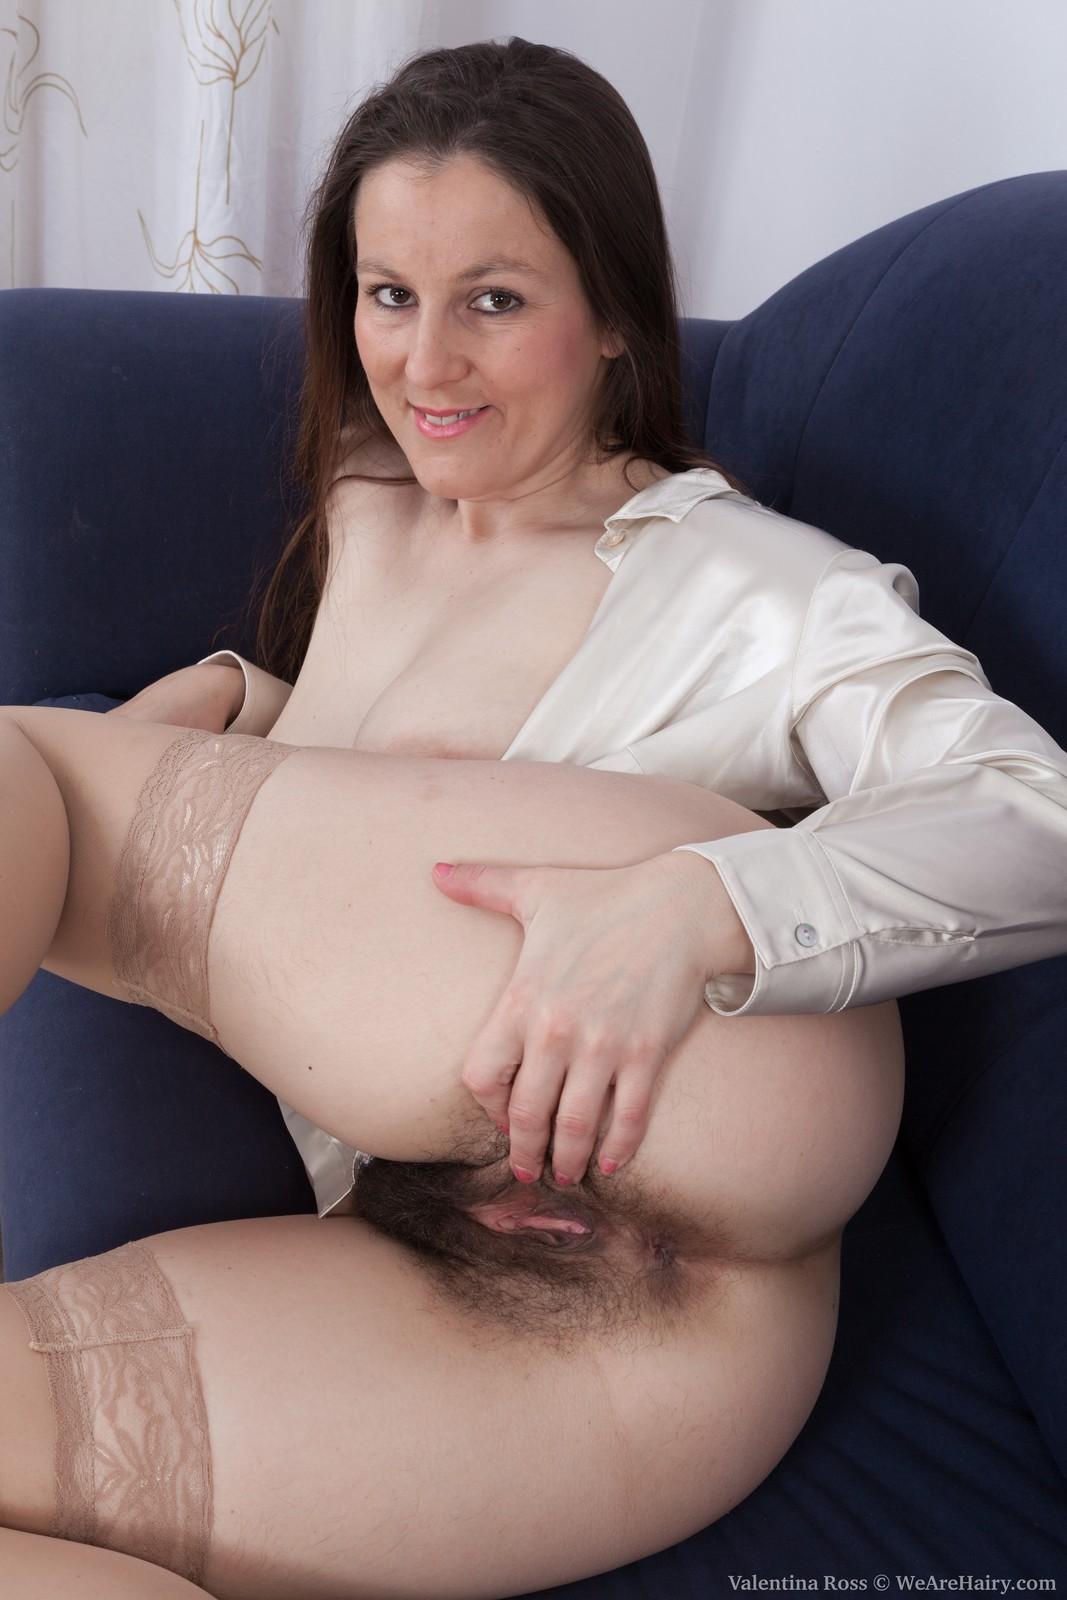 Idea naked czech girl hairy pussy think